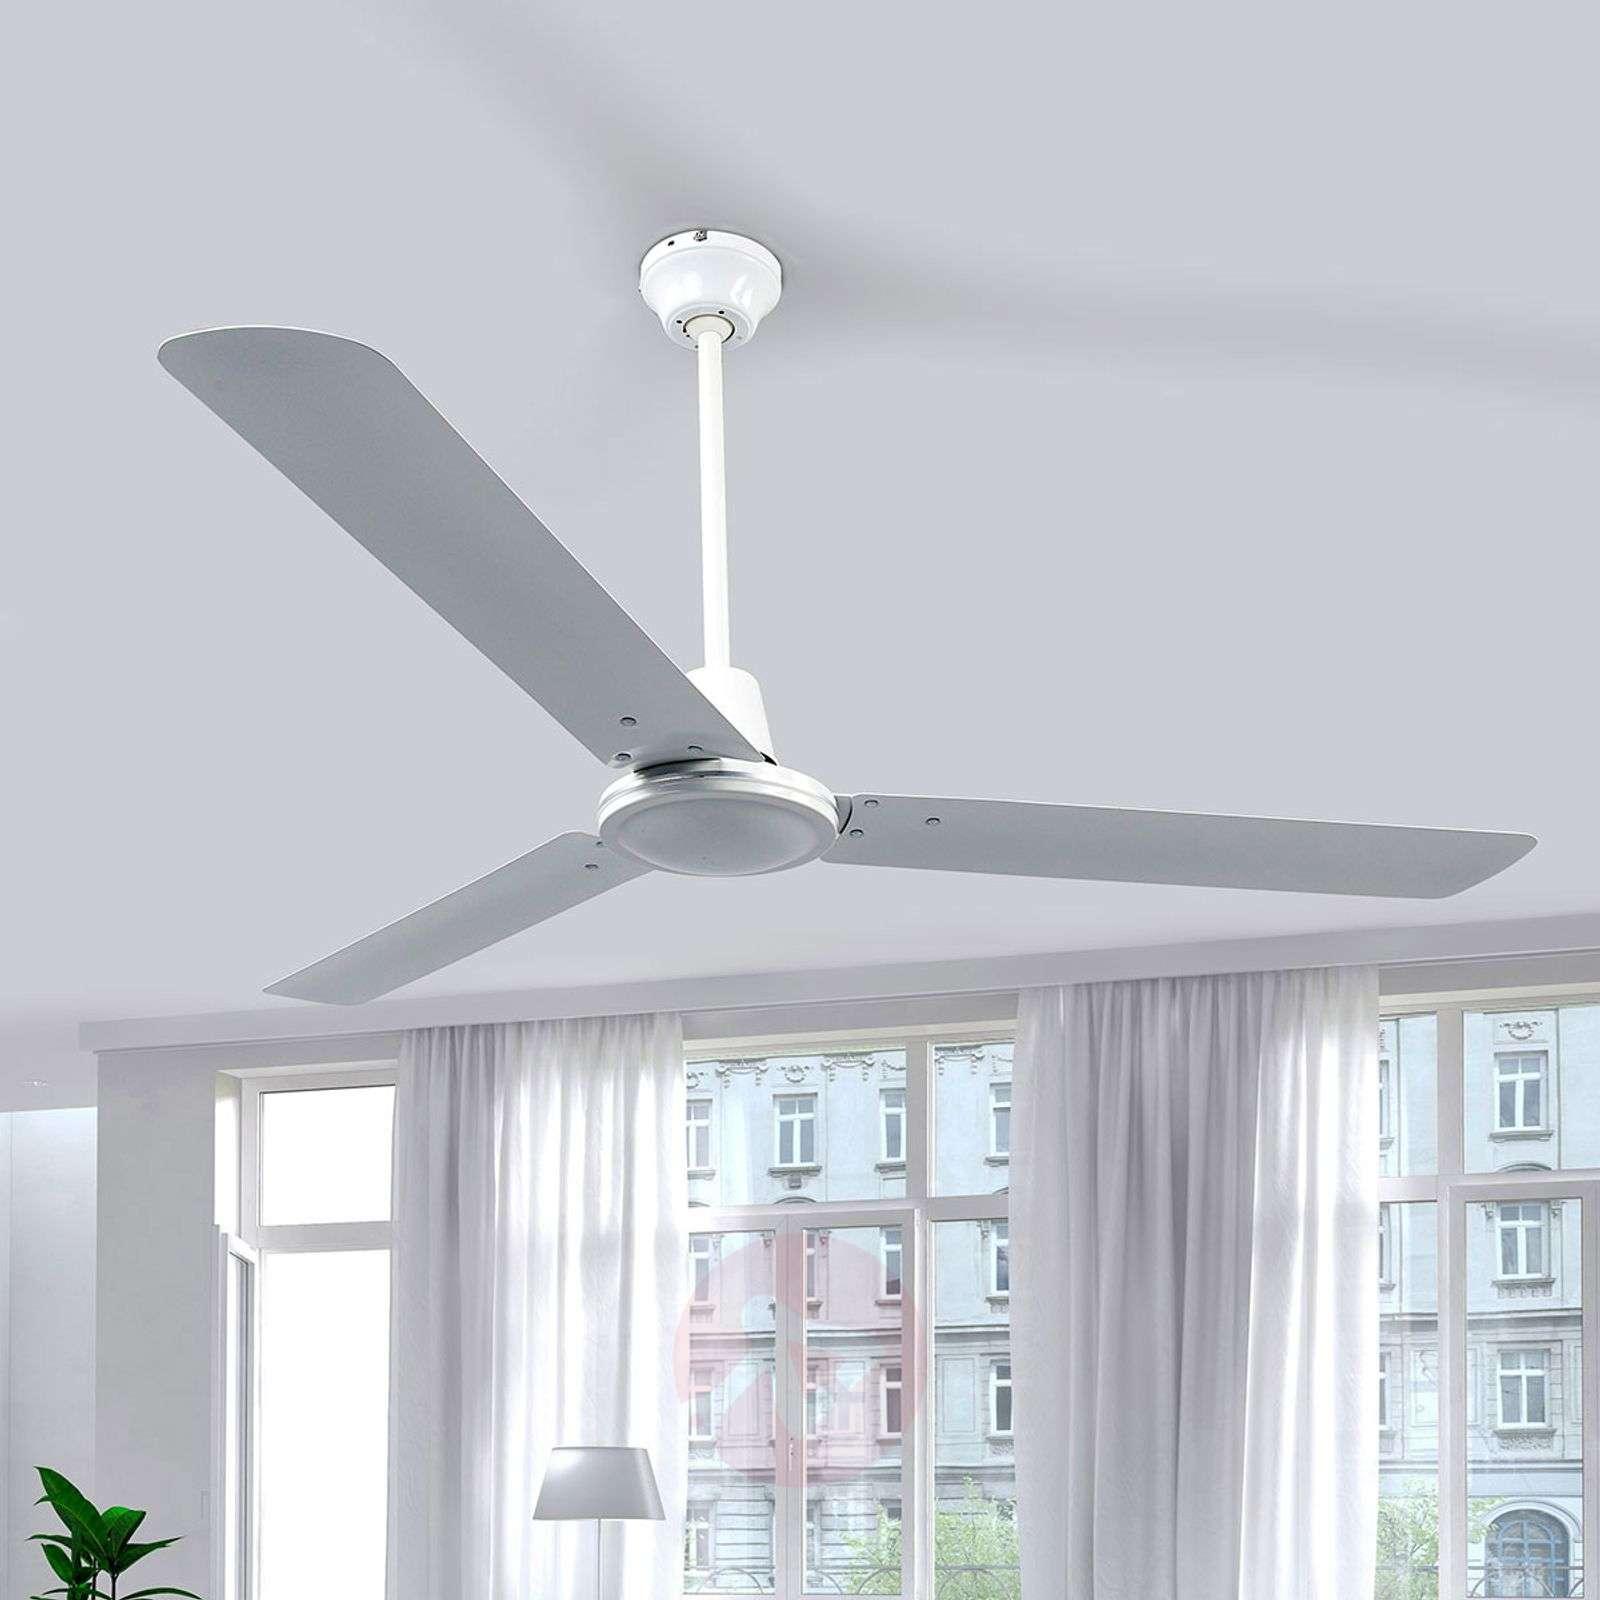 Dawinja three-blade, white ceiling fan_4018099_1